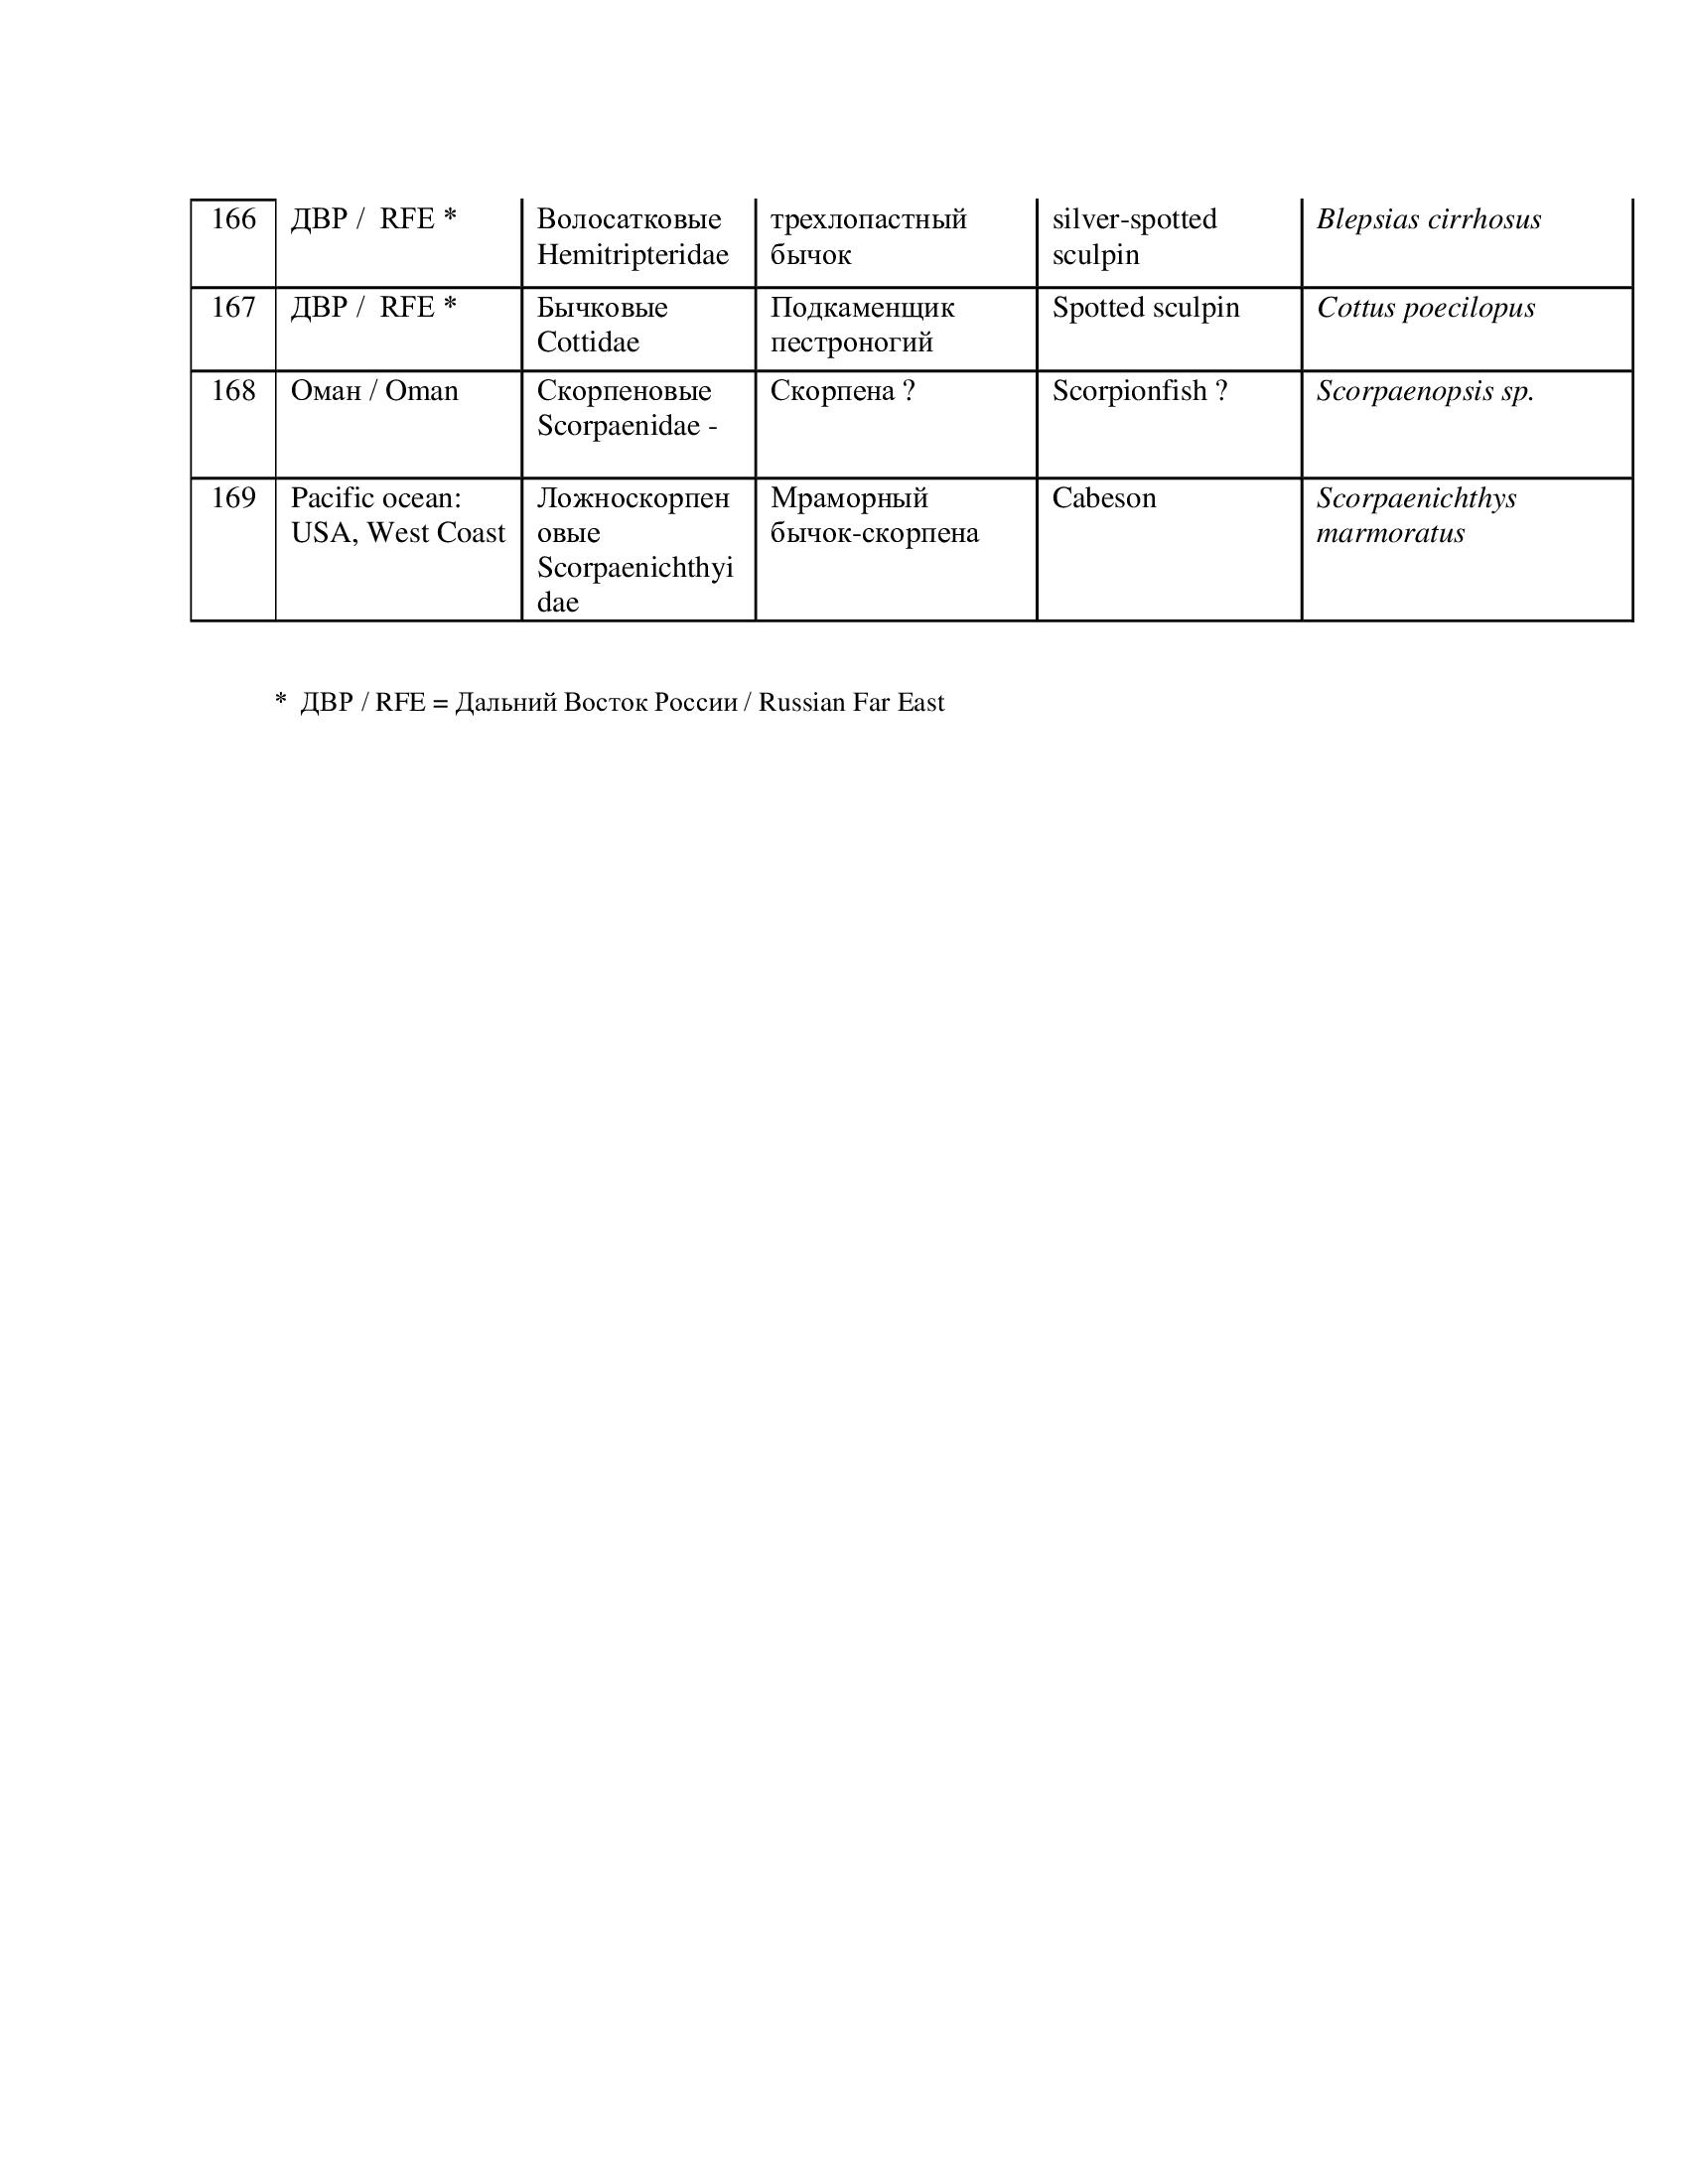 Mikhail Skopets-flyfishing-species list